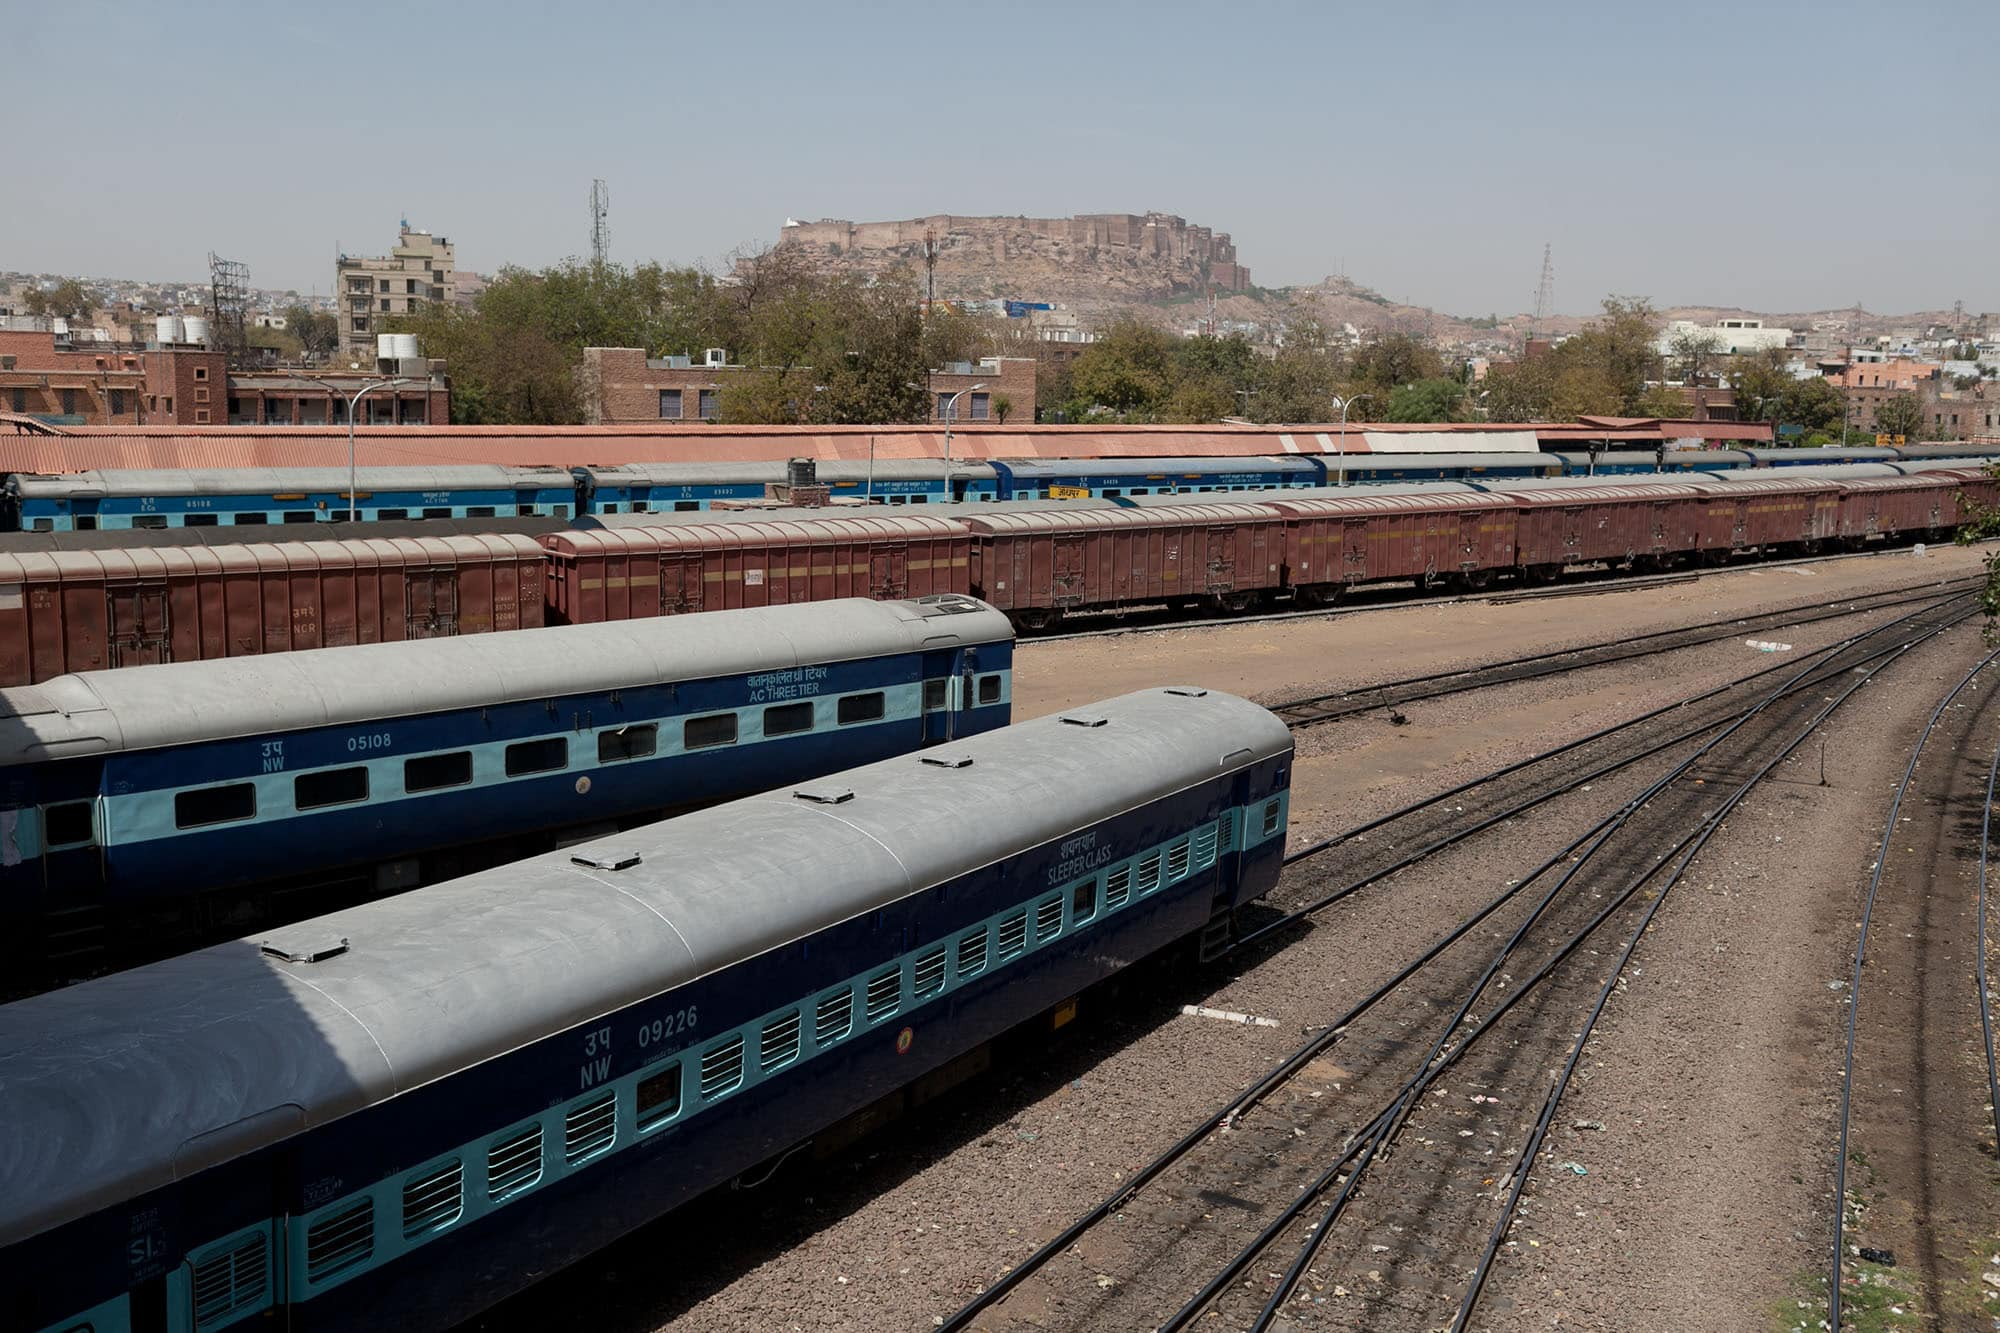 Train station in Jodhpur, India.